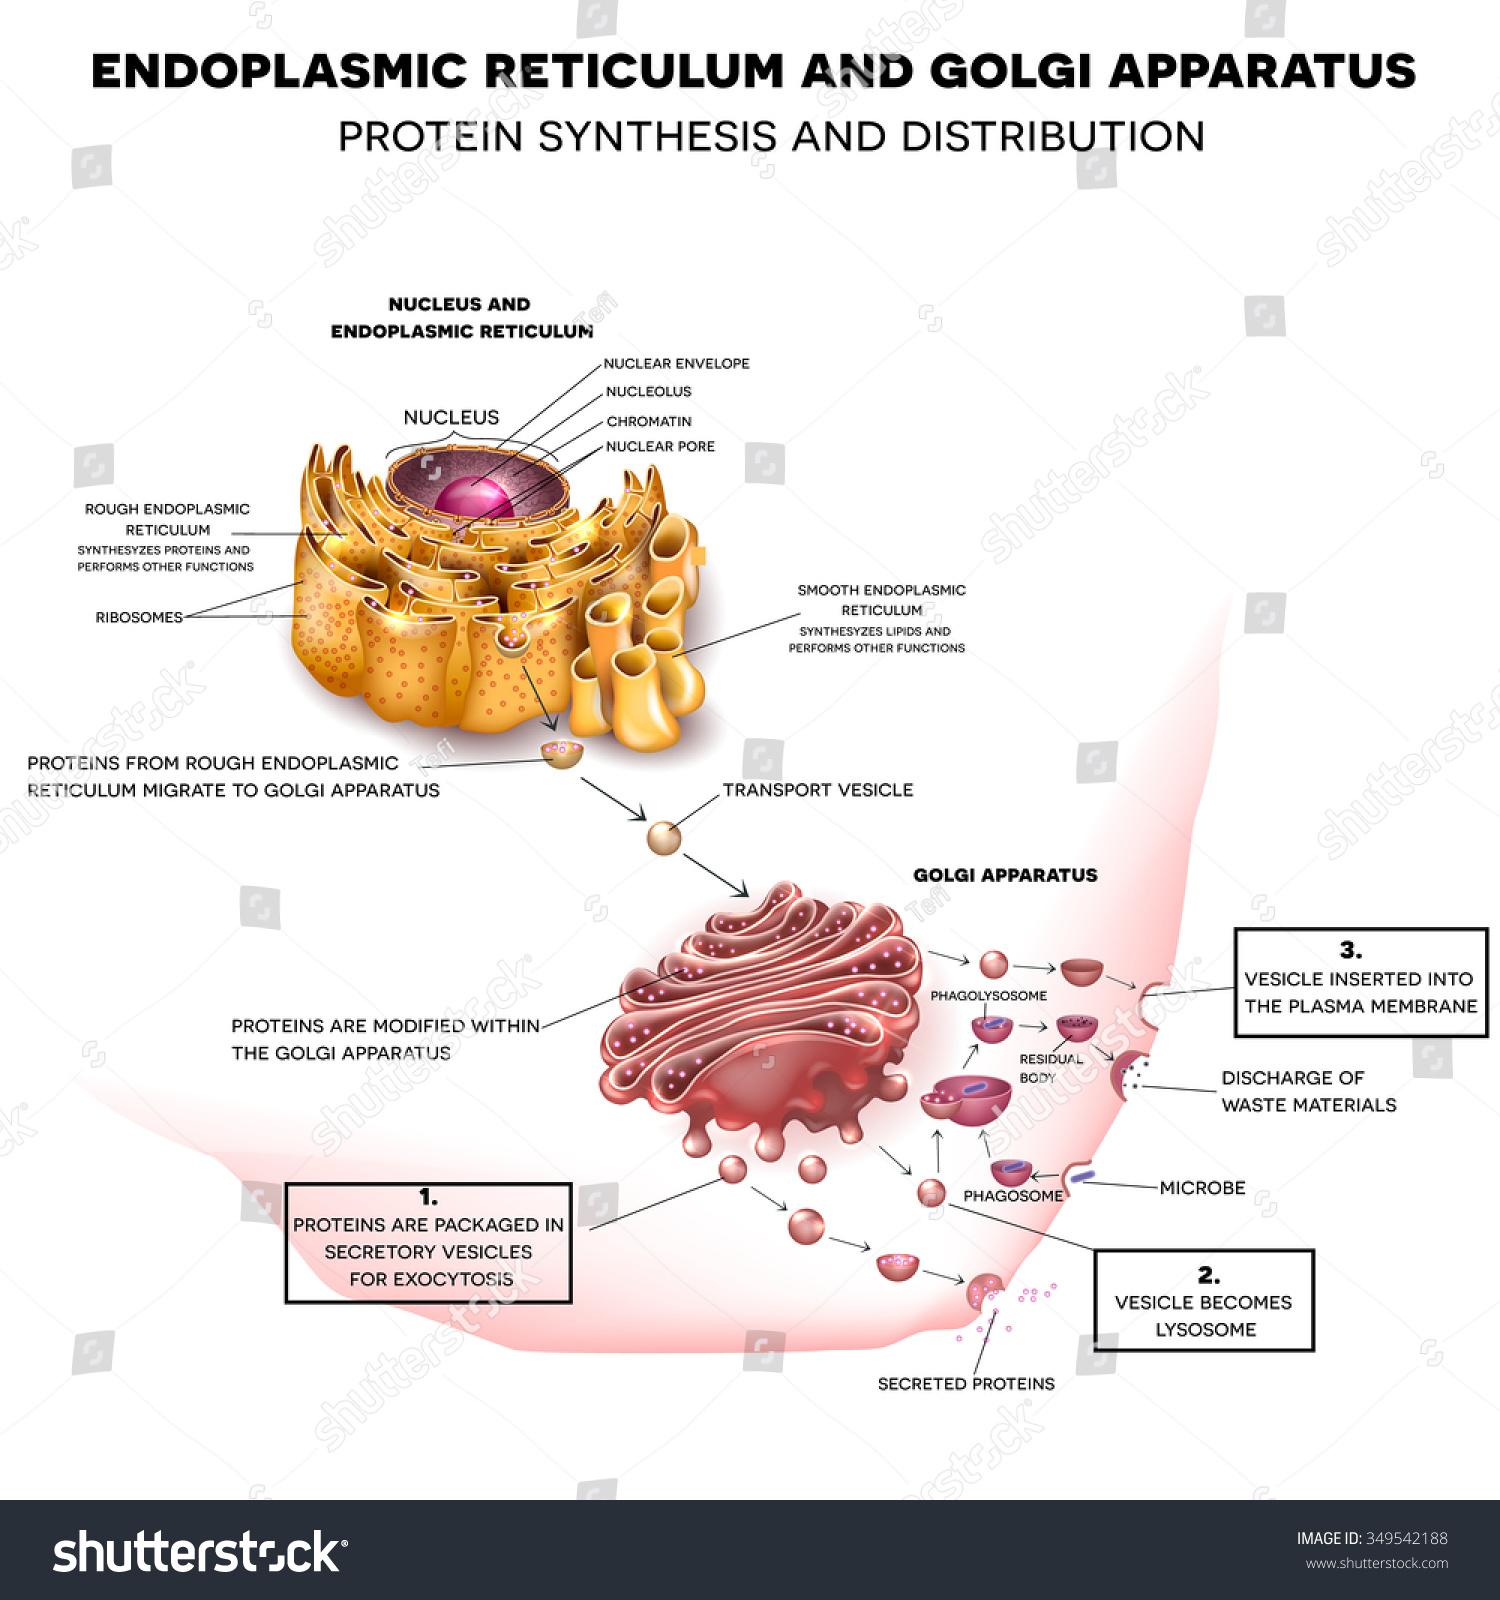 how to draw endoplasmic reticulum step by step